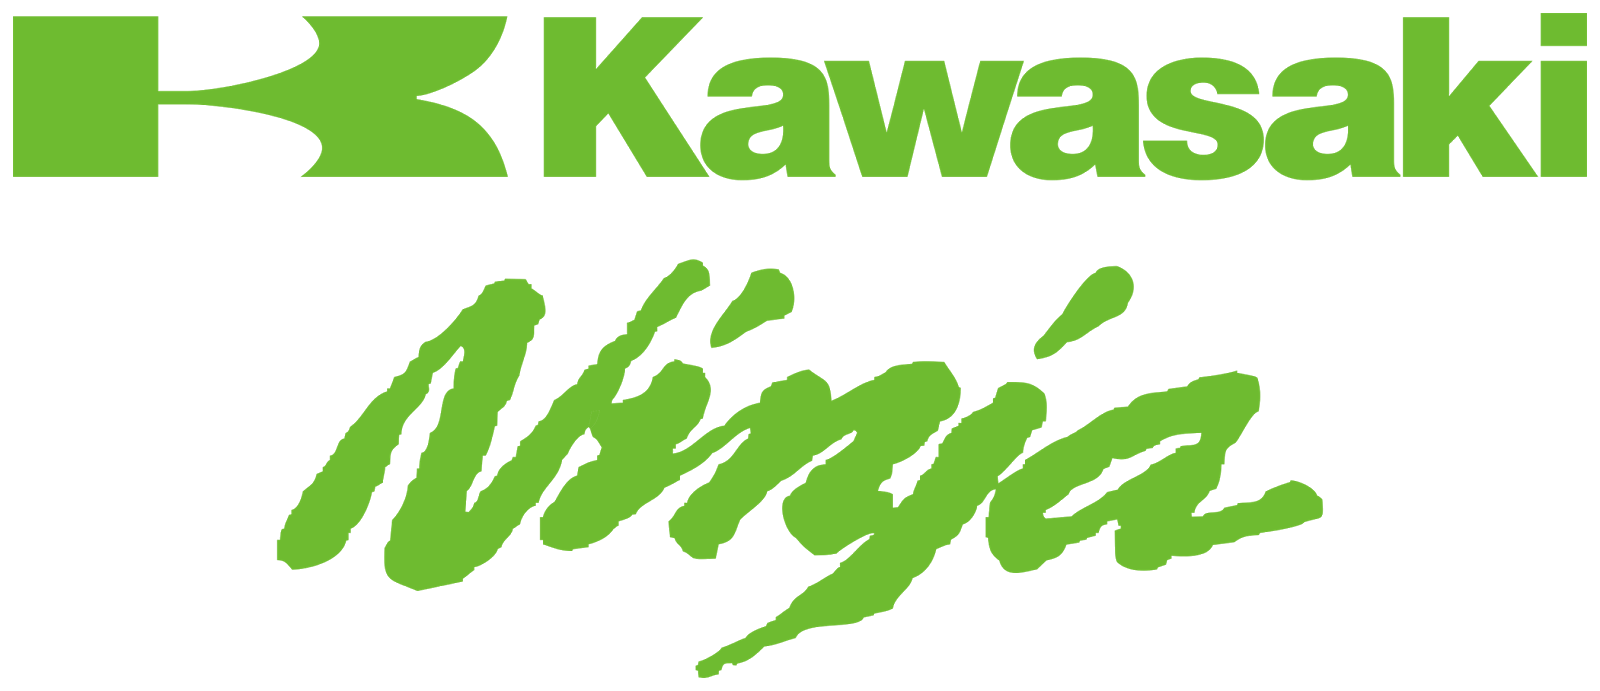 Kawasaki Ninja Logos